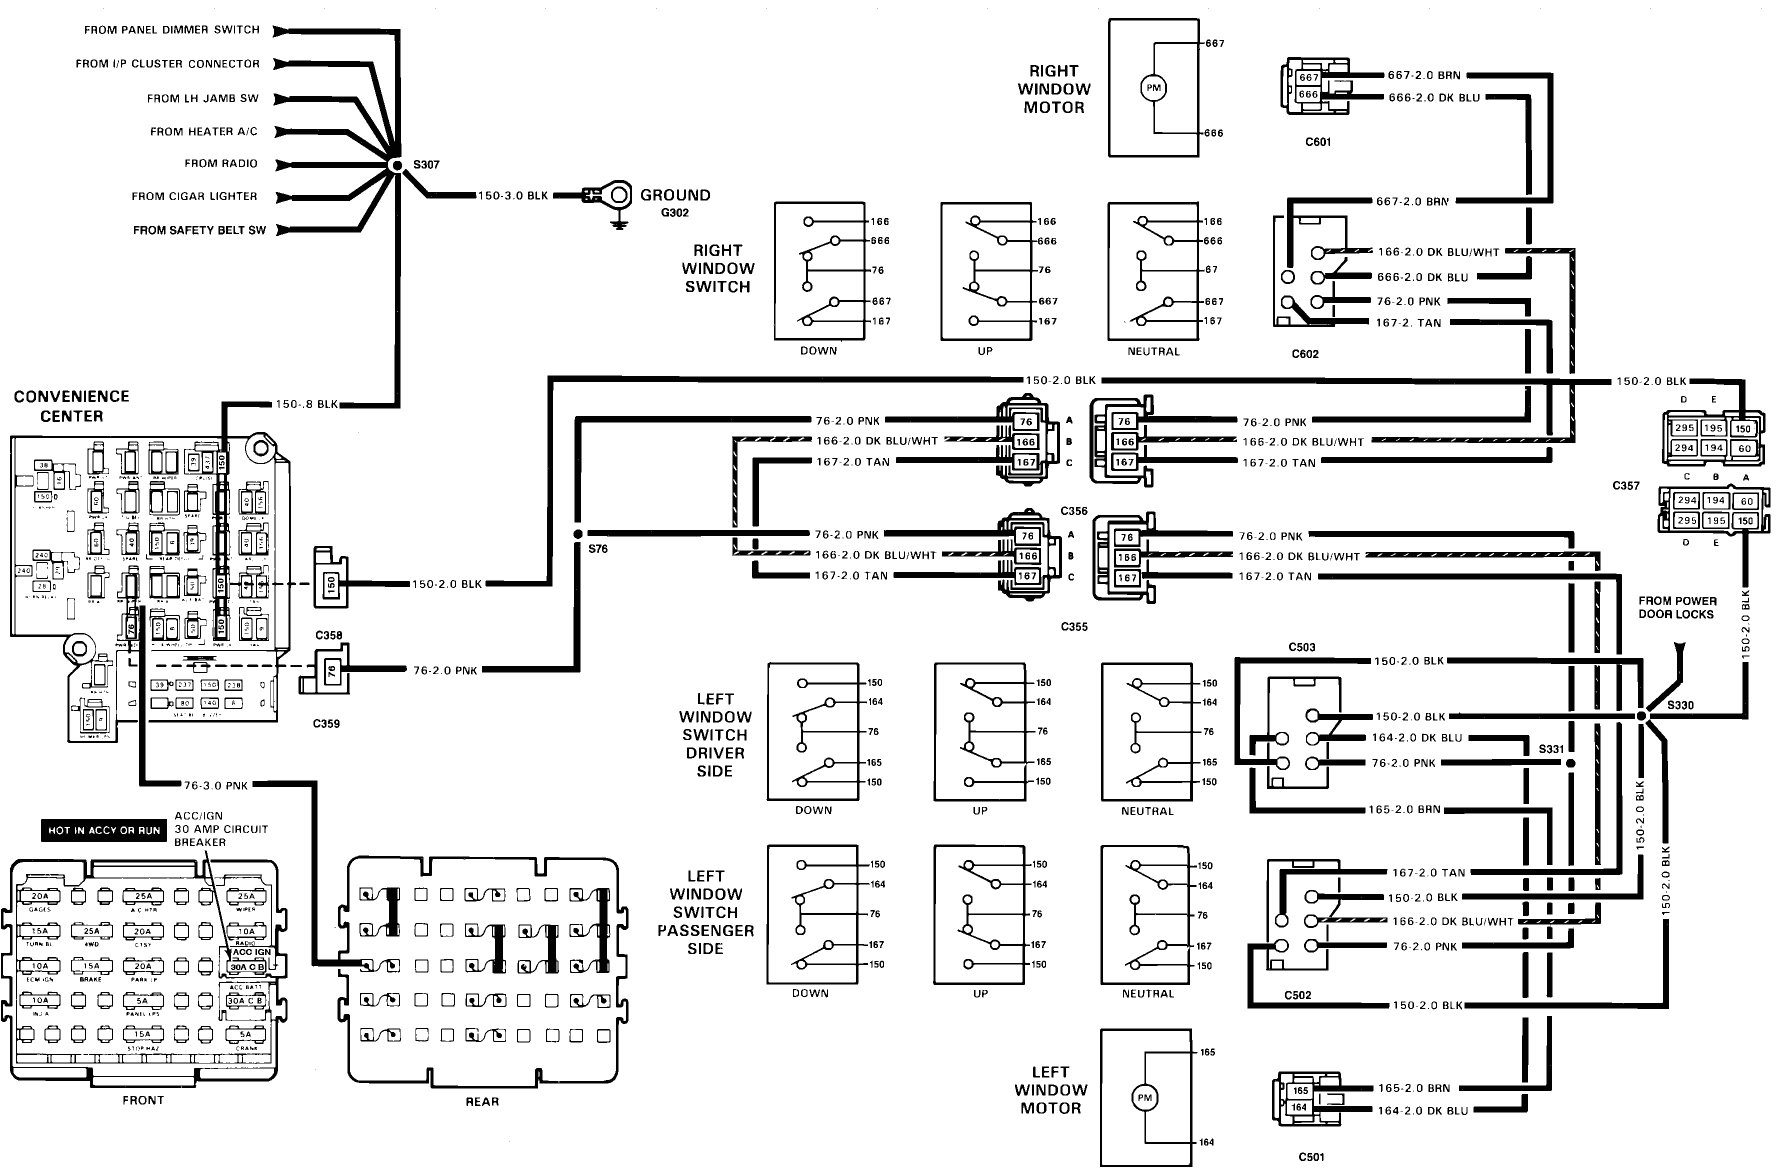 wiring diagram for 1993 chevy silverado wiring diagram expert 1993 chevy silverado wiring diagram 1993 chevy silverado wiring diagram